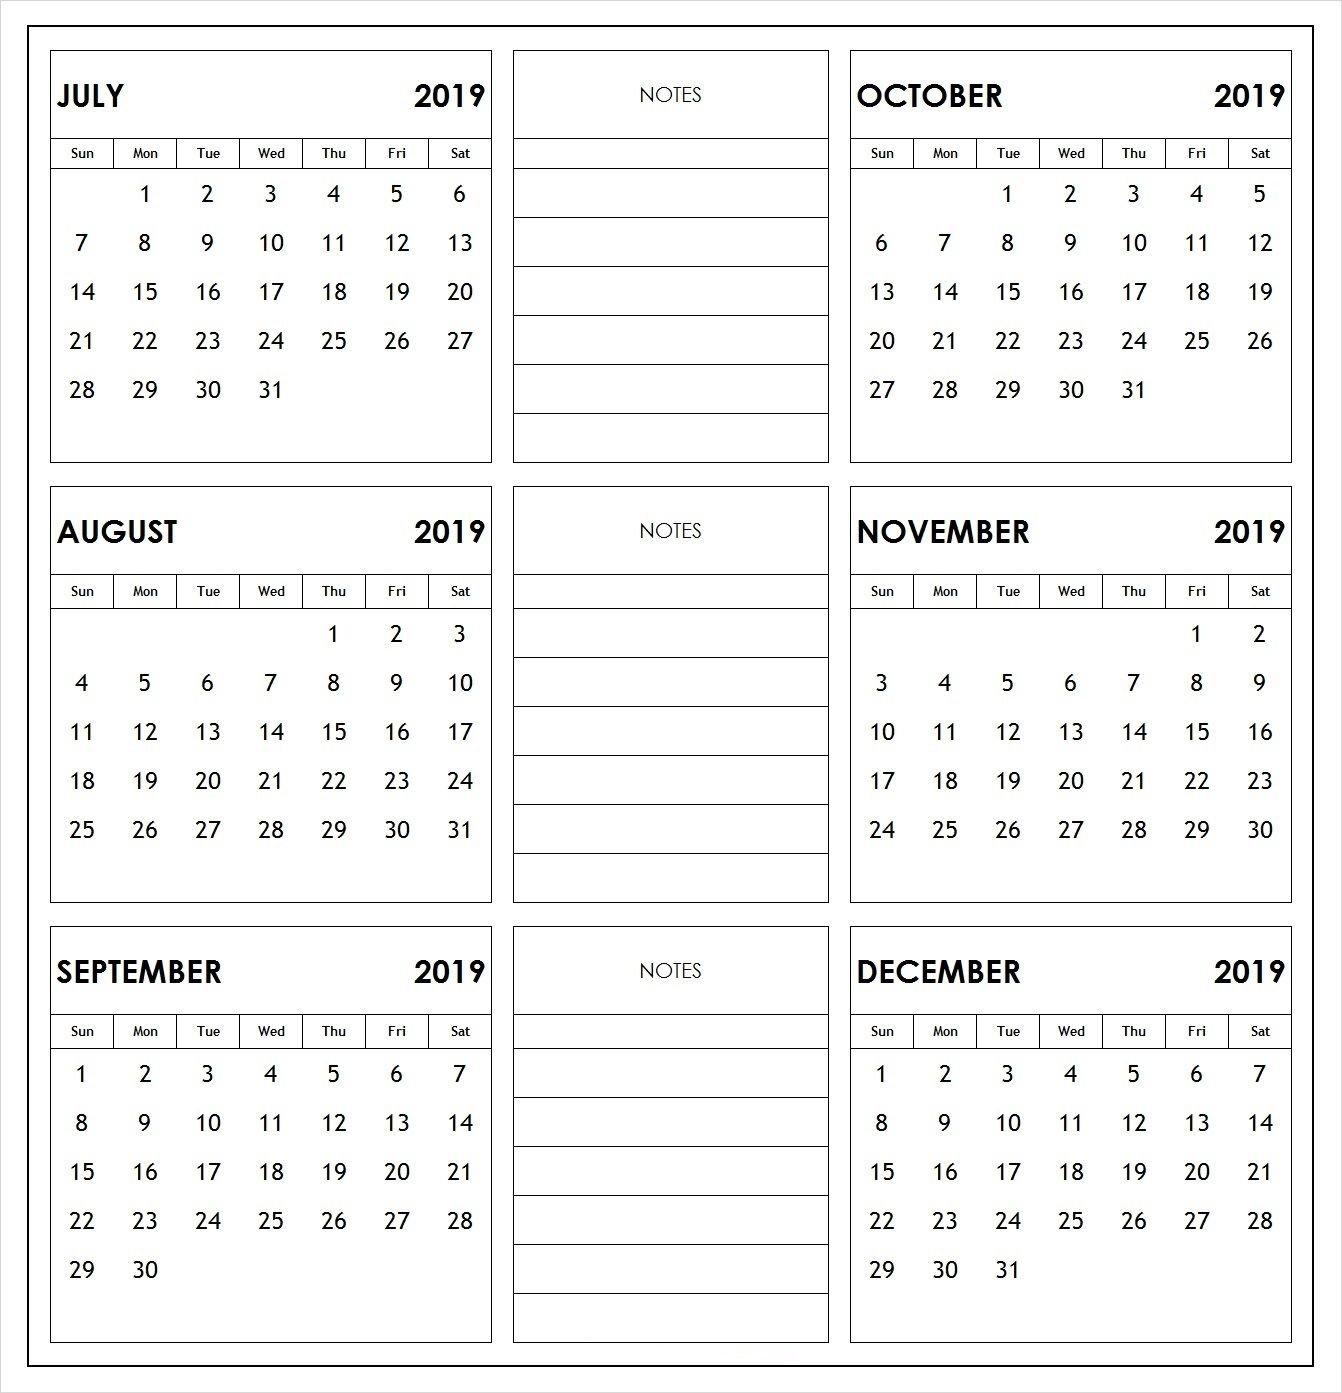 2019 Half Year Print Calendar   2019 Calendars   Academic Calendar January 6 2019 Calendar